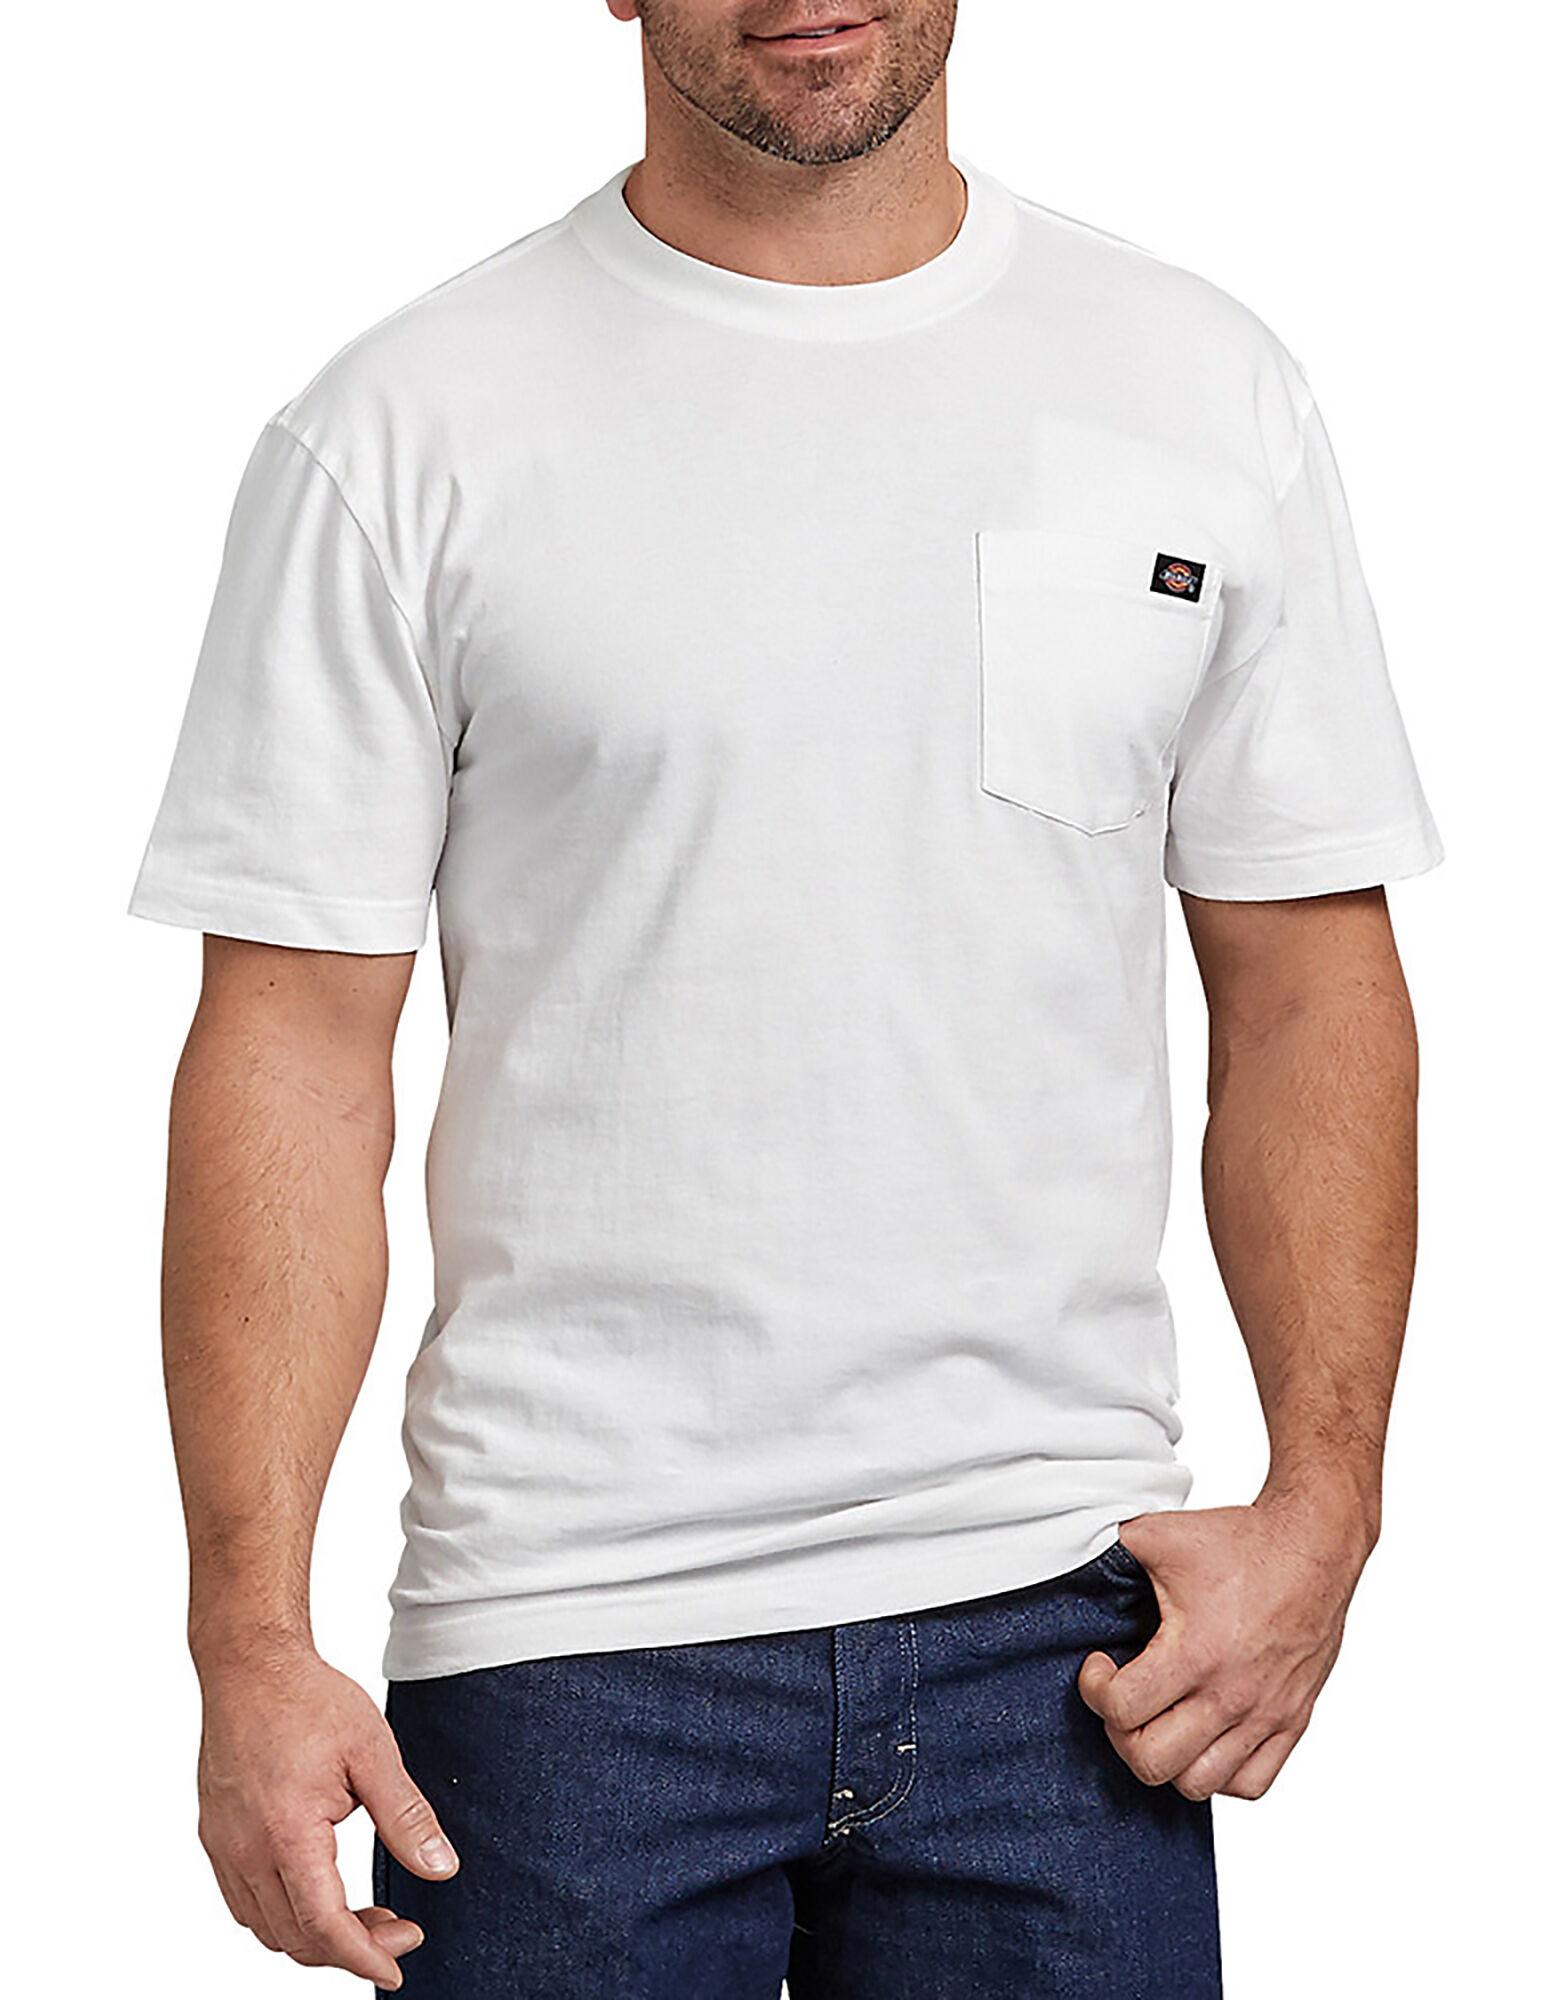 6773d6d3 Short Sleeve Heavyweight Crew Neck Tee White L| Mens Shirts ...